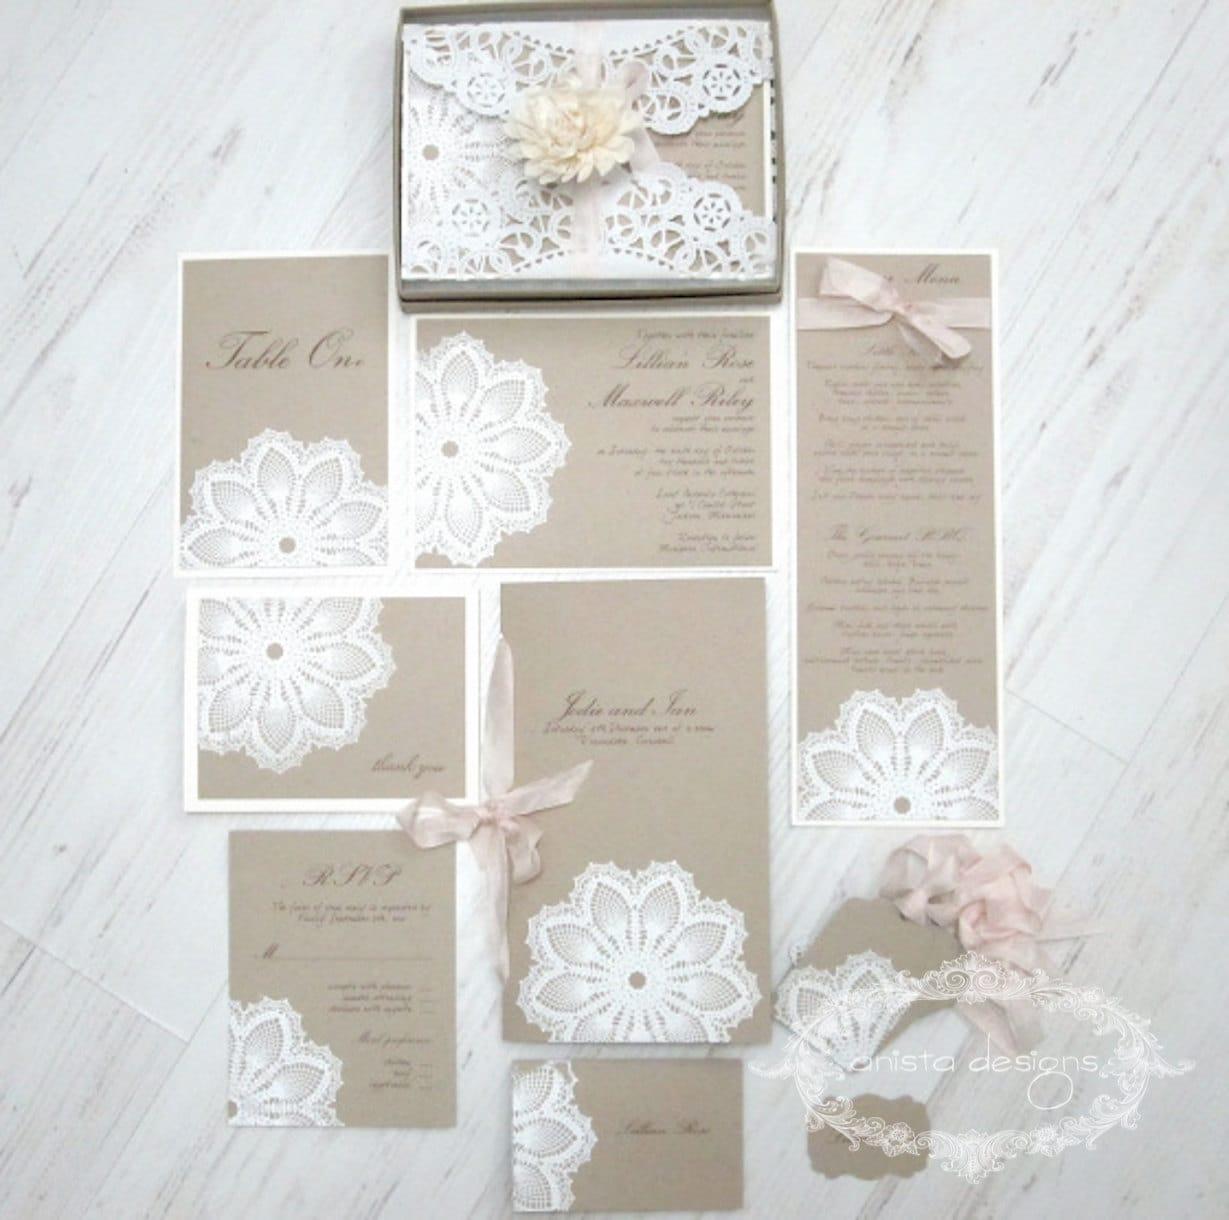 SALE: vintage lace wedding invitation Lace doily featured